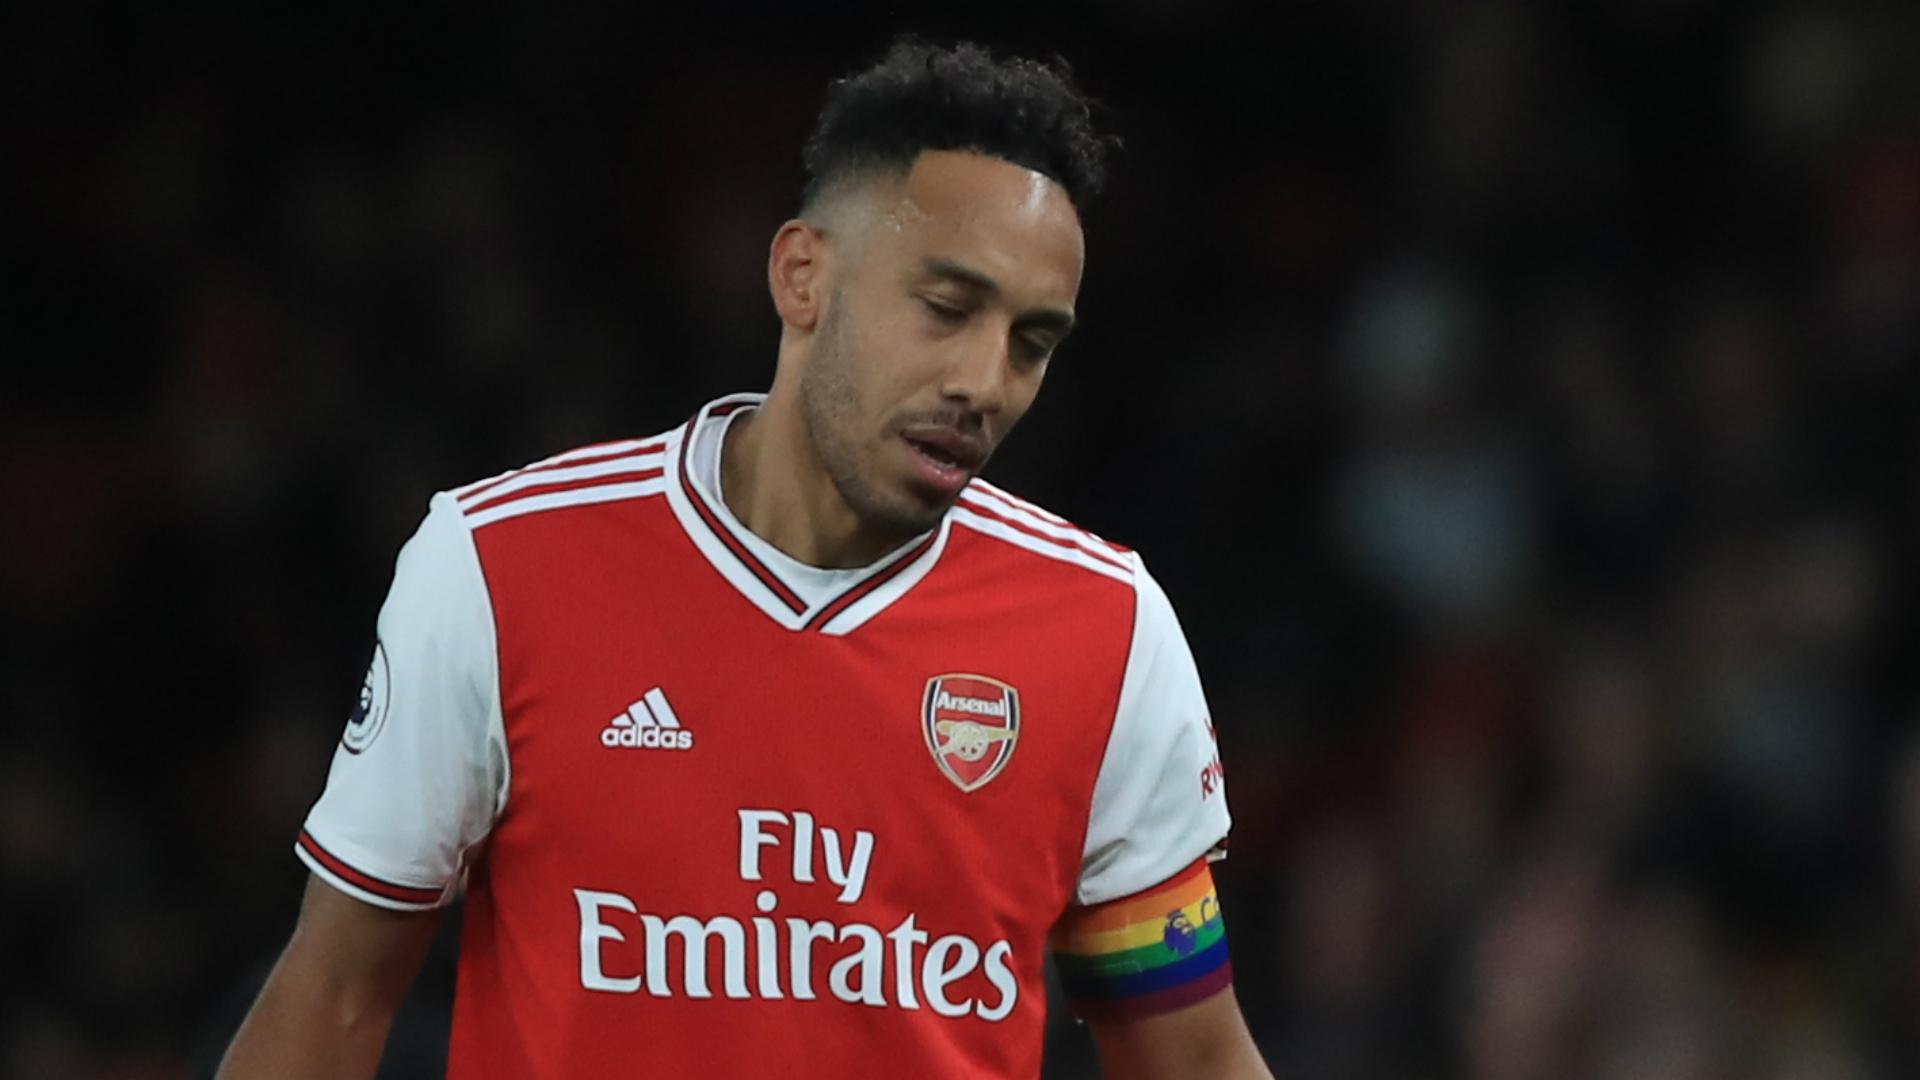 Arteta unsure over captaincy but accepts Arsenal need role models